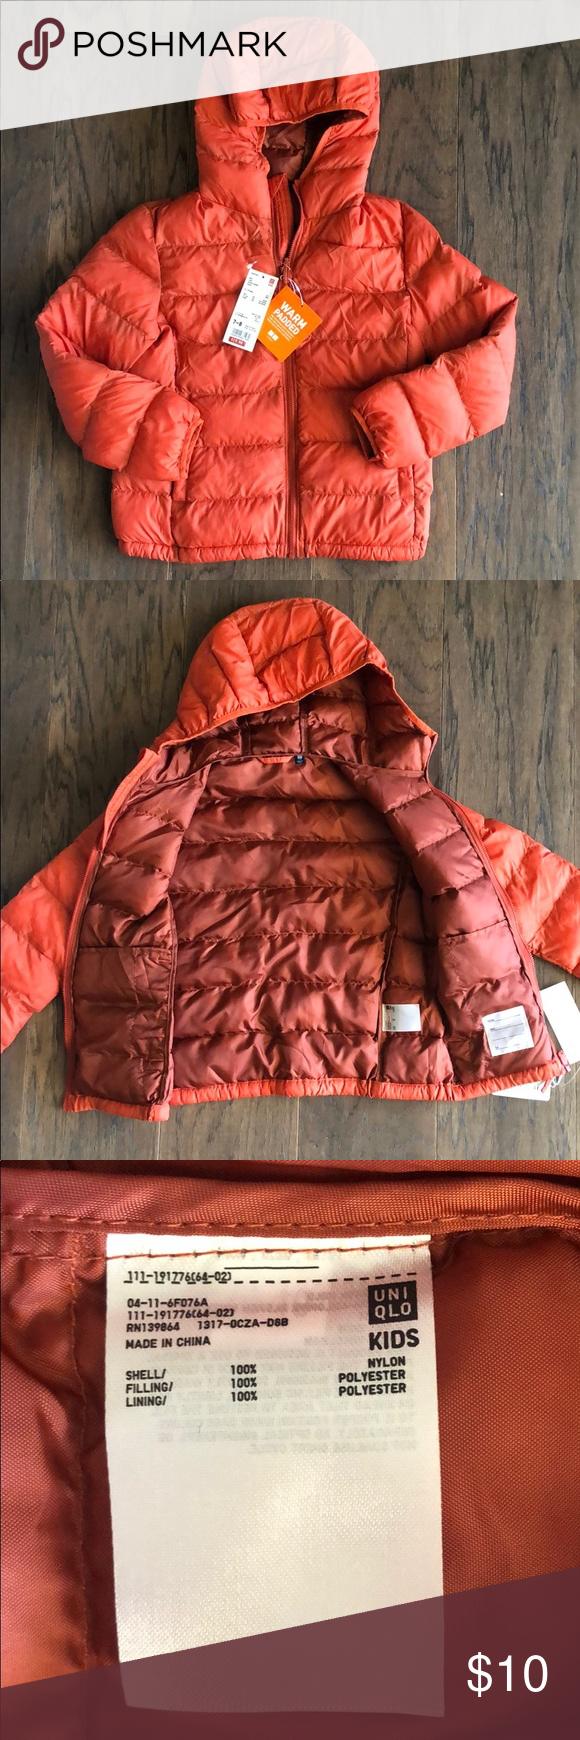 fff3cef4c Cute UNIQLO kids warm padded jacket Super cute orange/red kids jacket. This  jacket